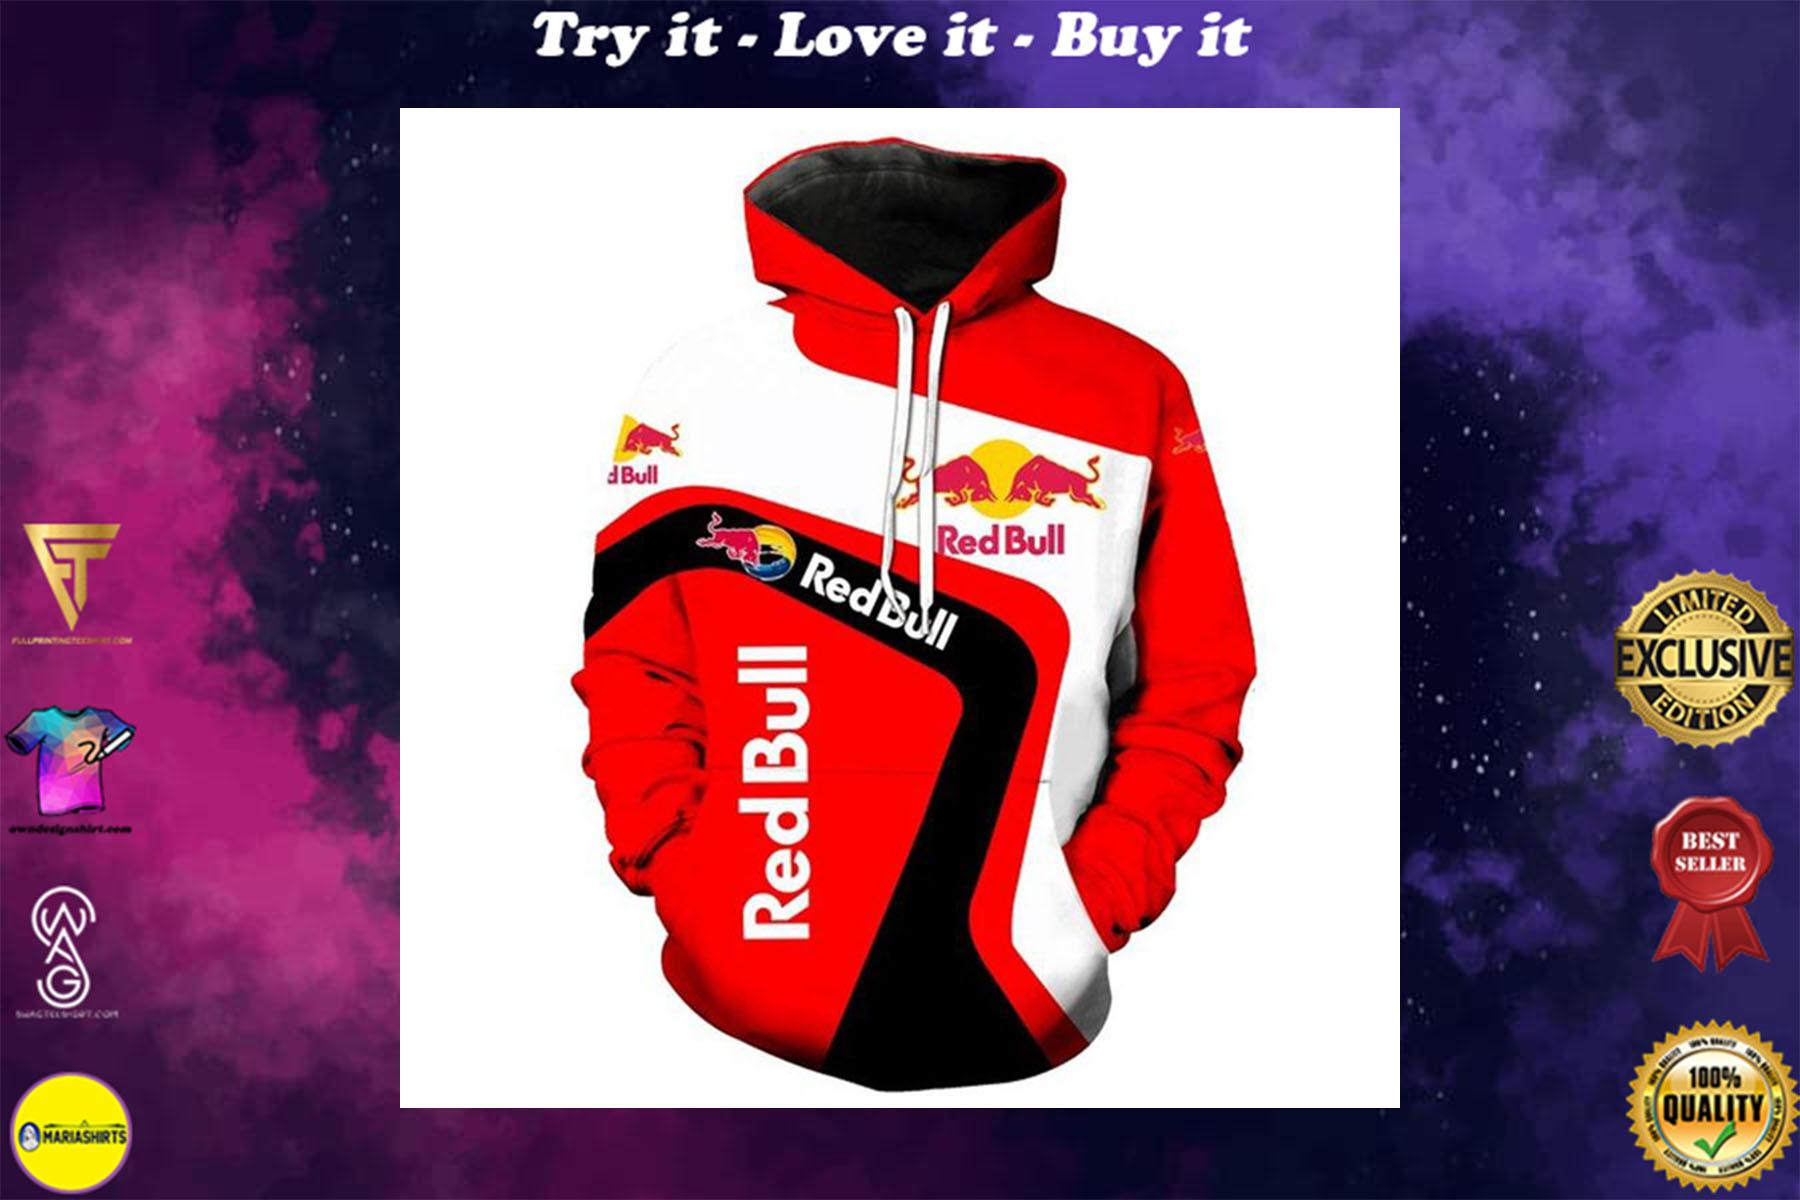 [highest selling] ktm redbull team motorcycle sport riding racing full printing shirt - maria